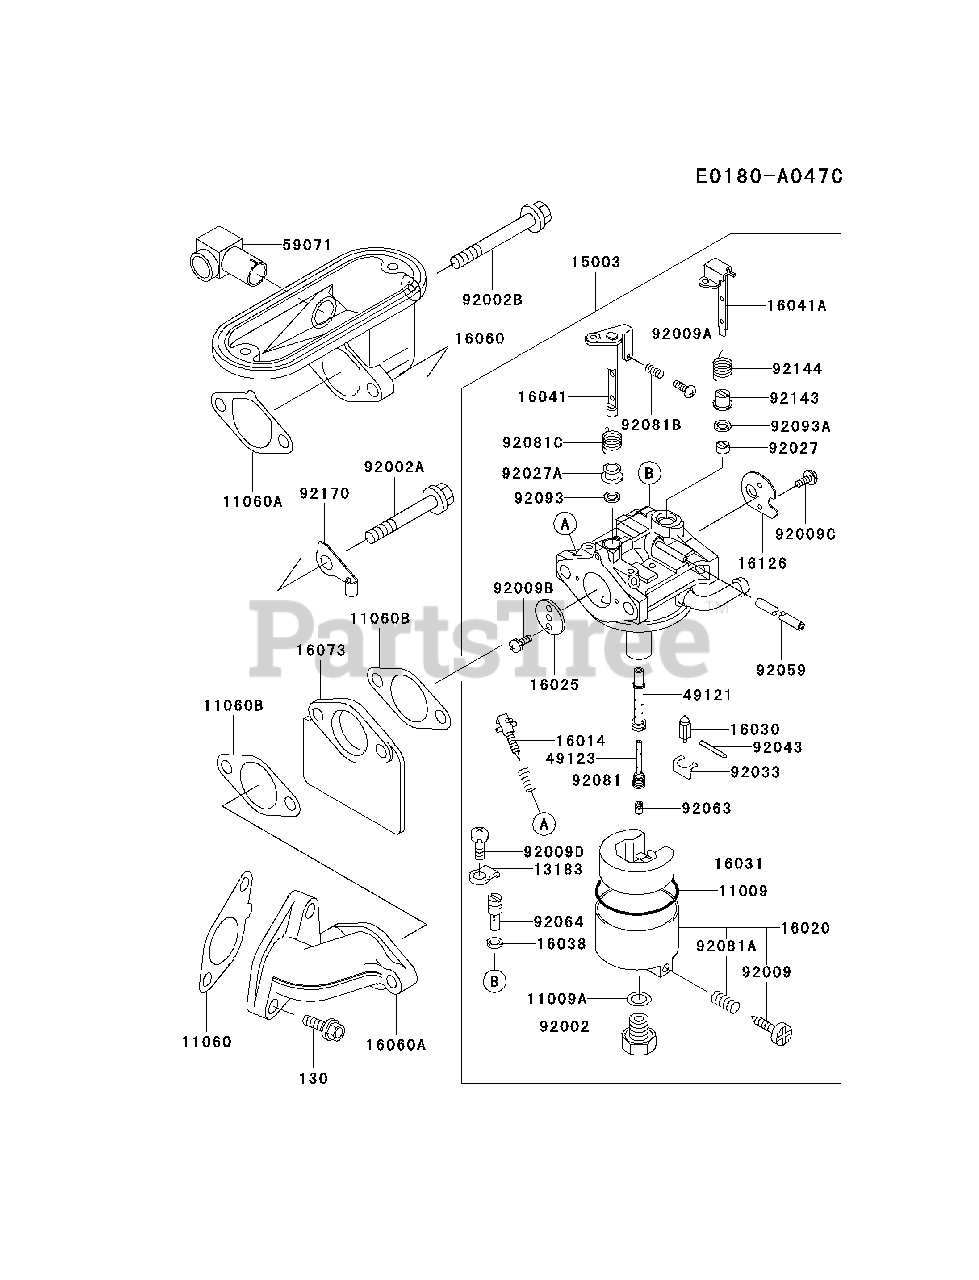 [SCHEMATICS_4FR]  Kawasaki FB460V-ES33 - Kawasaki Engine CARBURETOR Parts Lookup with Diagrams  | PartsTree | Kawasaki Engine Parts Diagrams |  | PartsTree